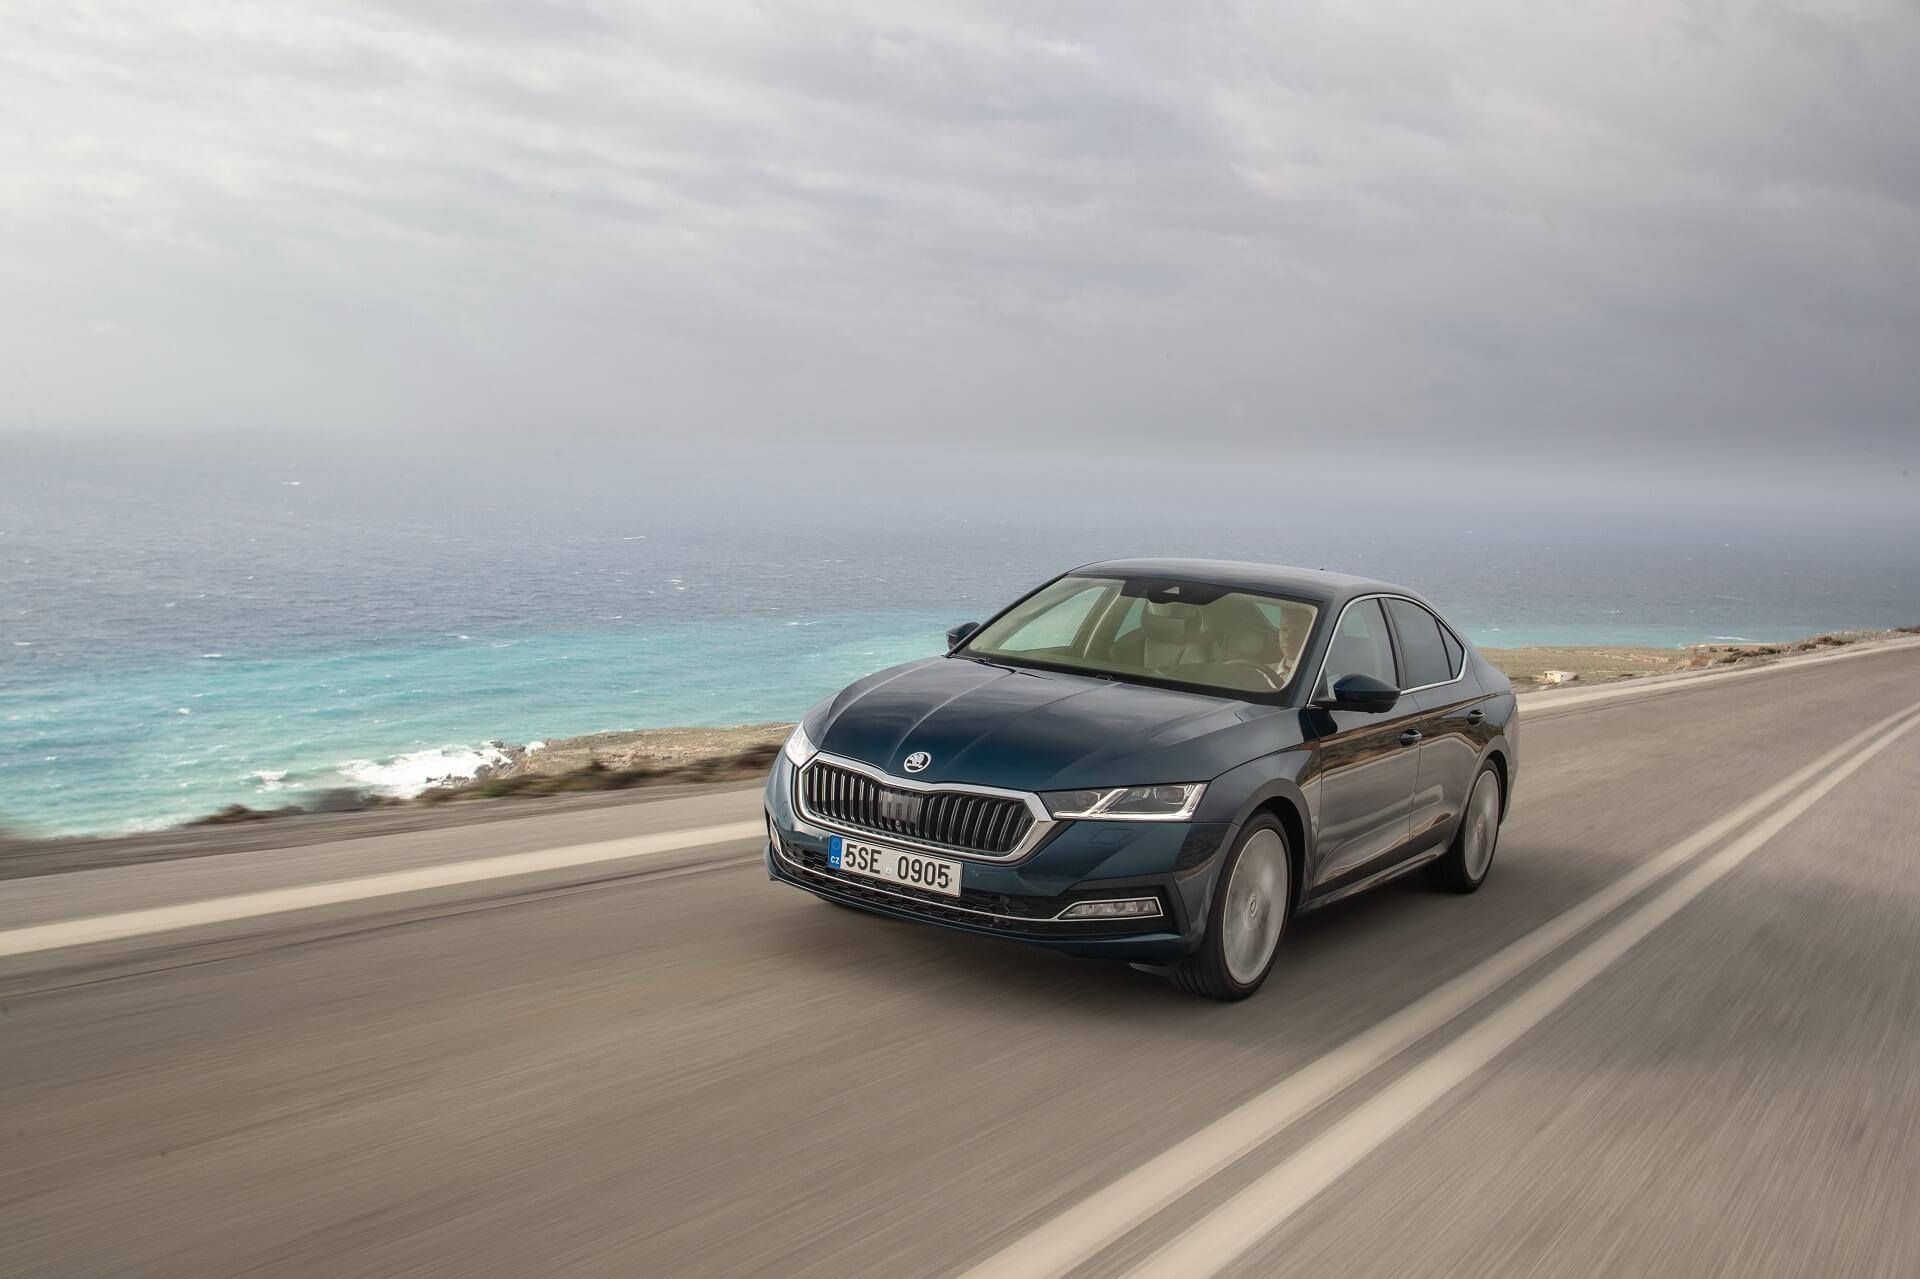 SKODA OCTAVIA - Νέο Αυτοκίνητο της Χρονιάς για το 2020 - Auto Express